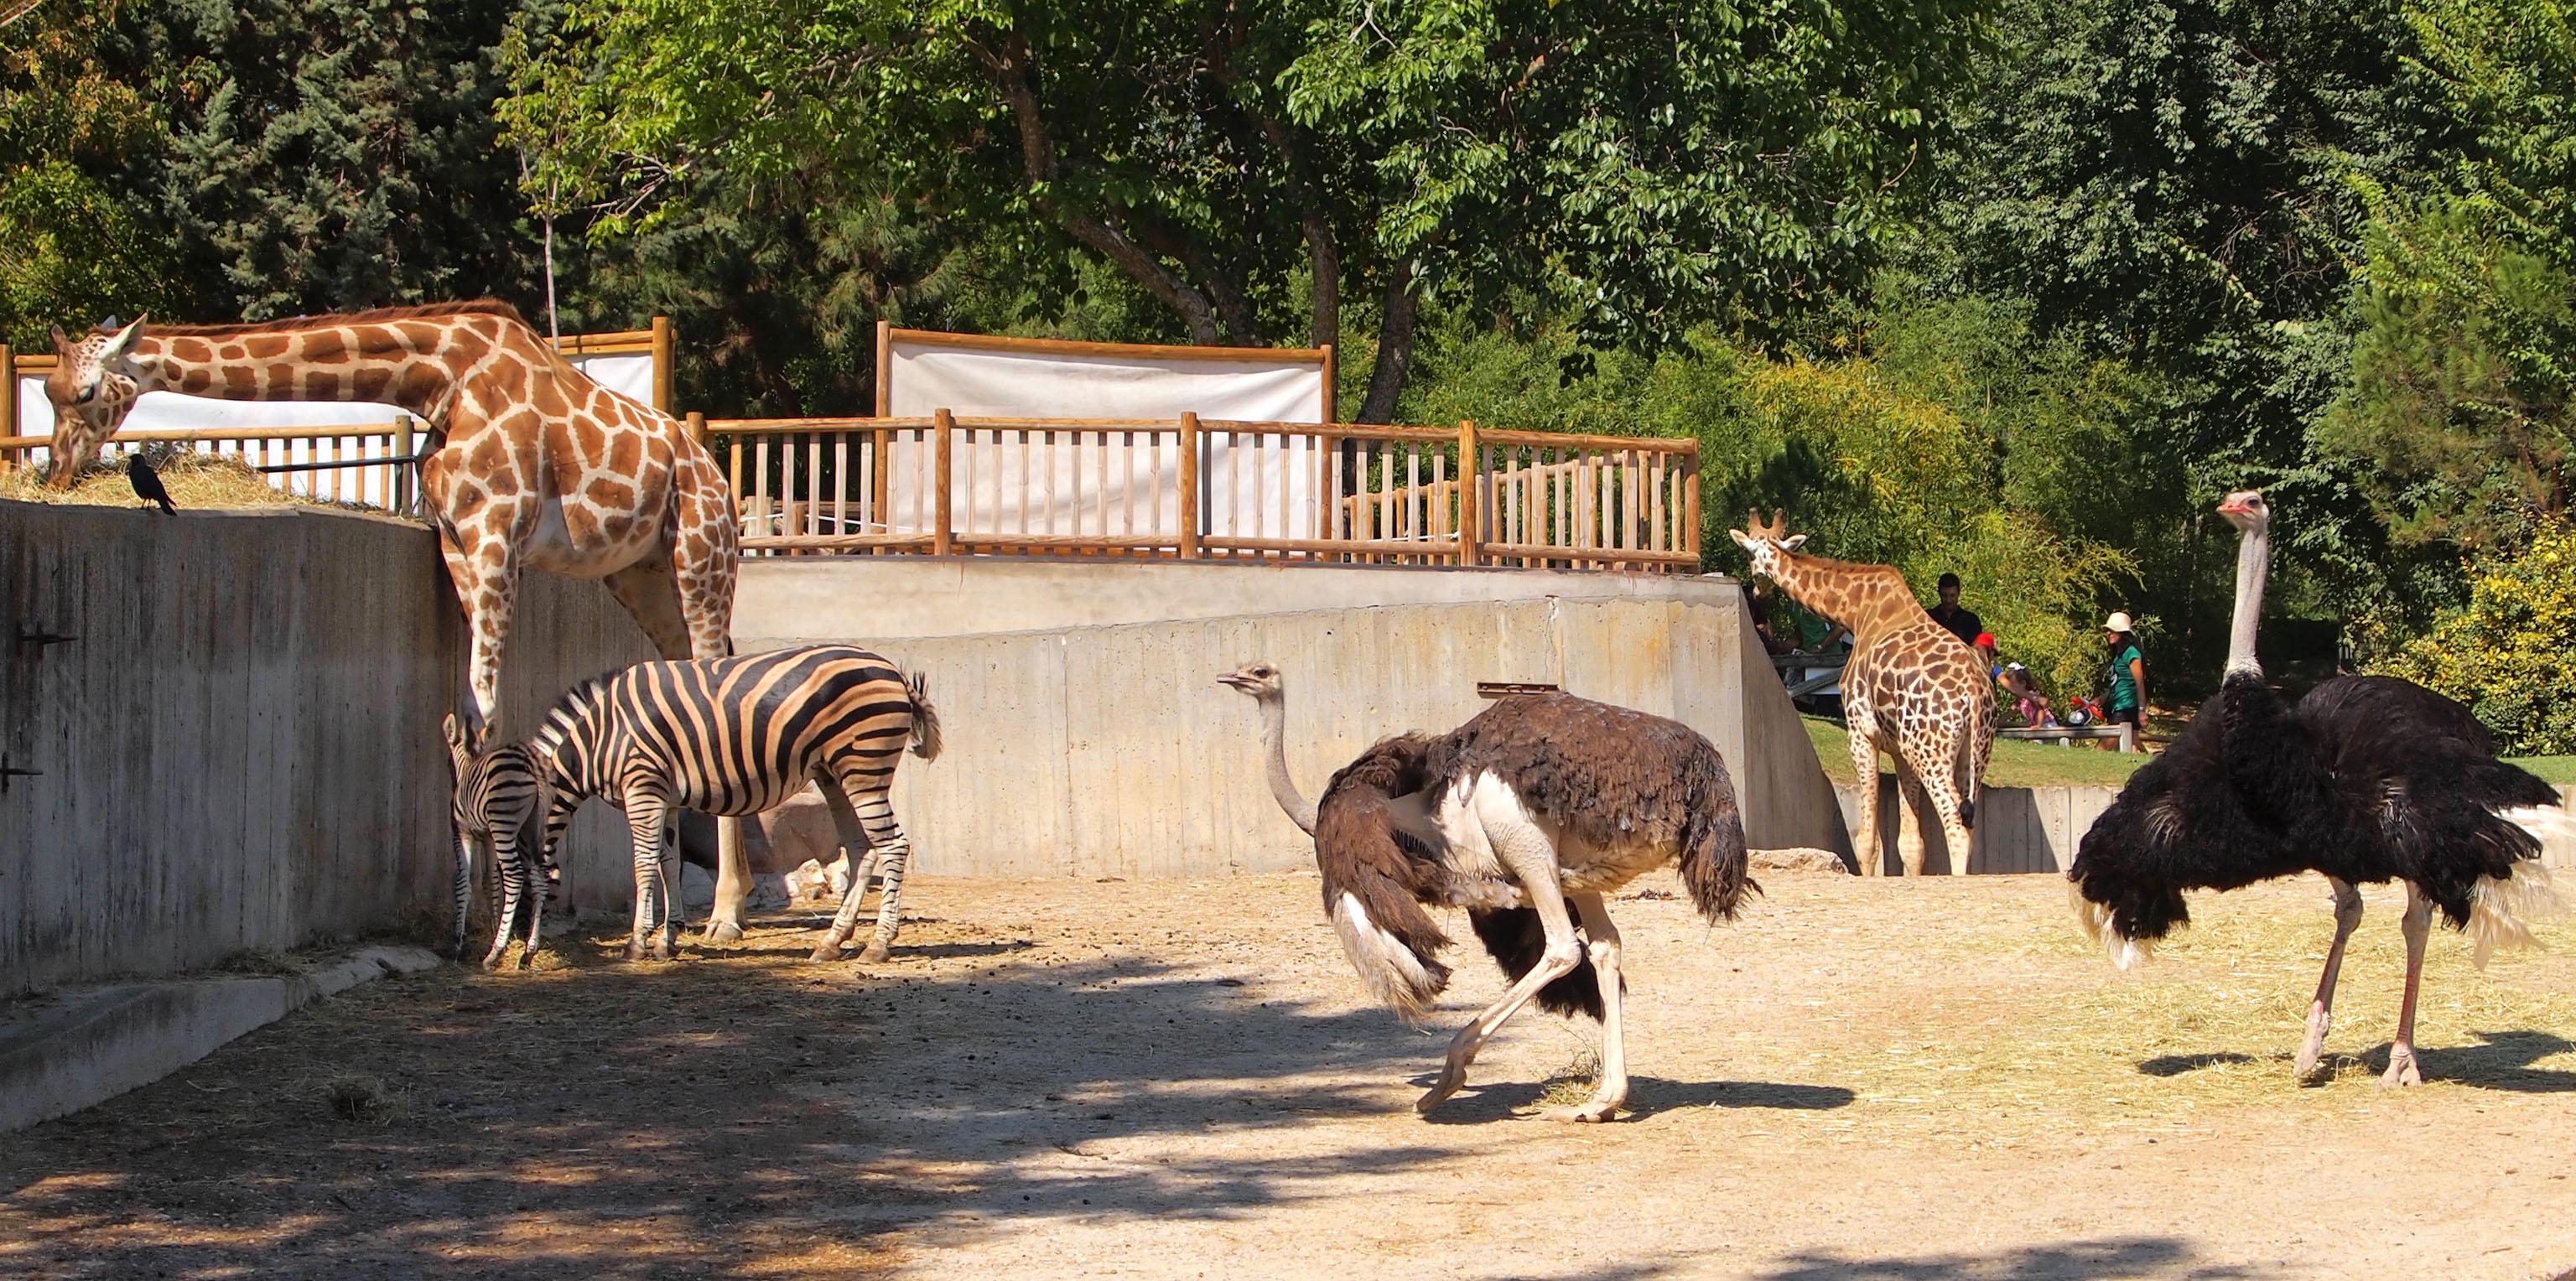 Willkommen im ErlebnisZoo  Erlebnis Zoo Hannover